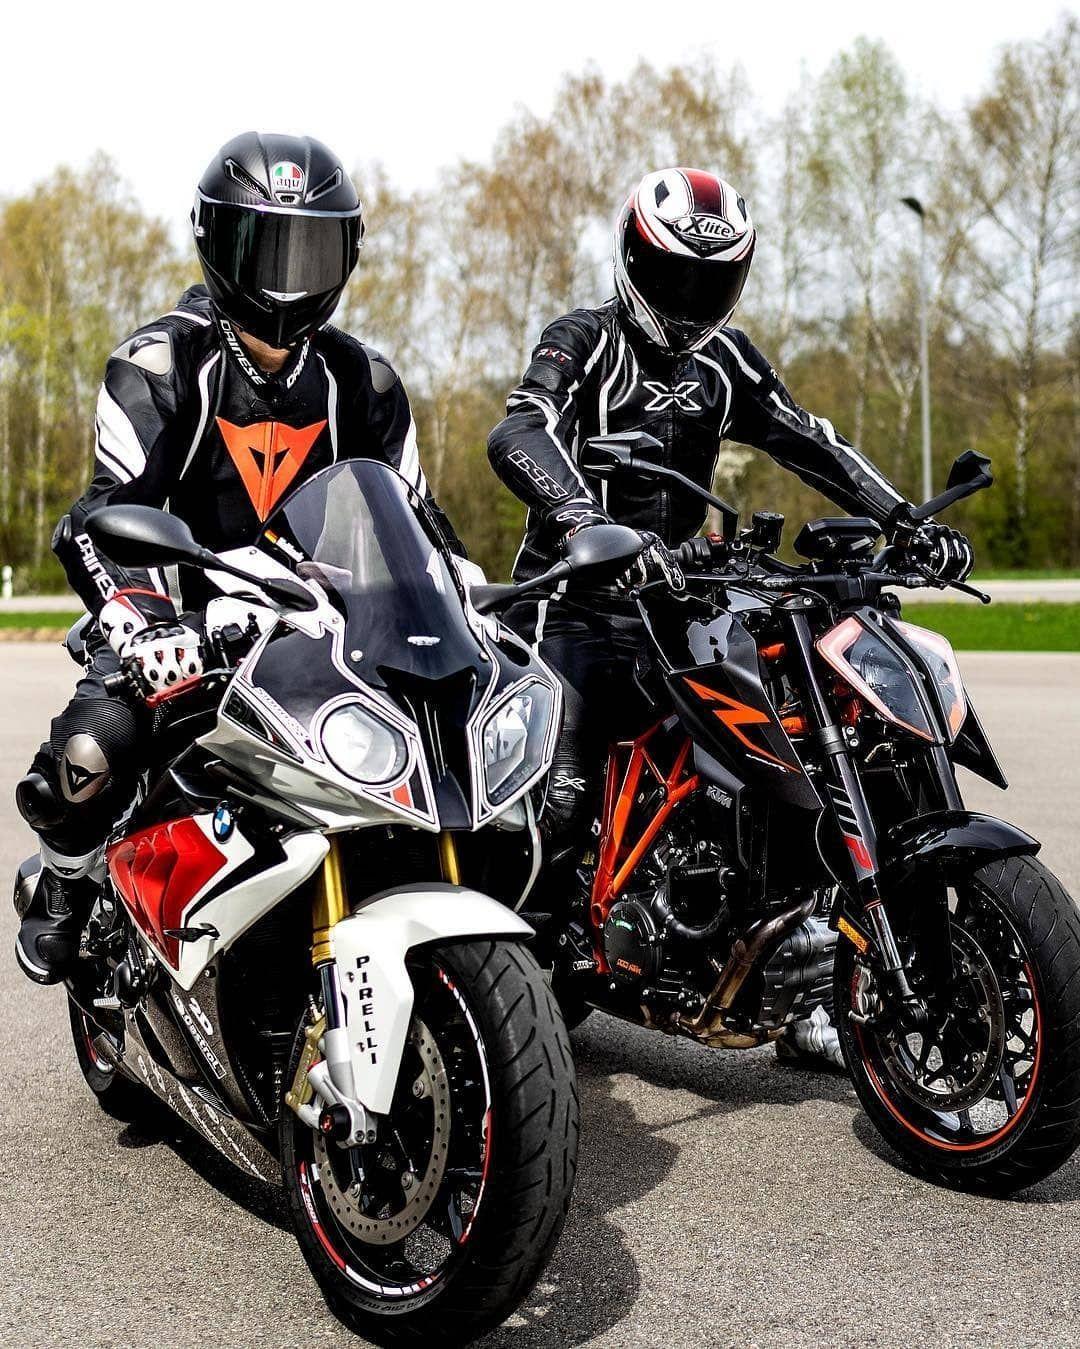 Bmw S1000rr Ktm Super Duke 1290r Malthaels Superbikesgram